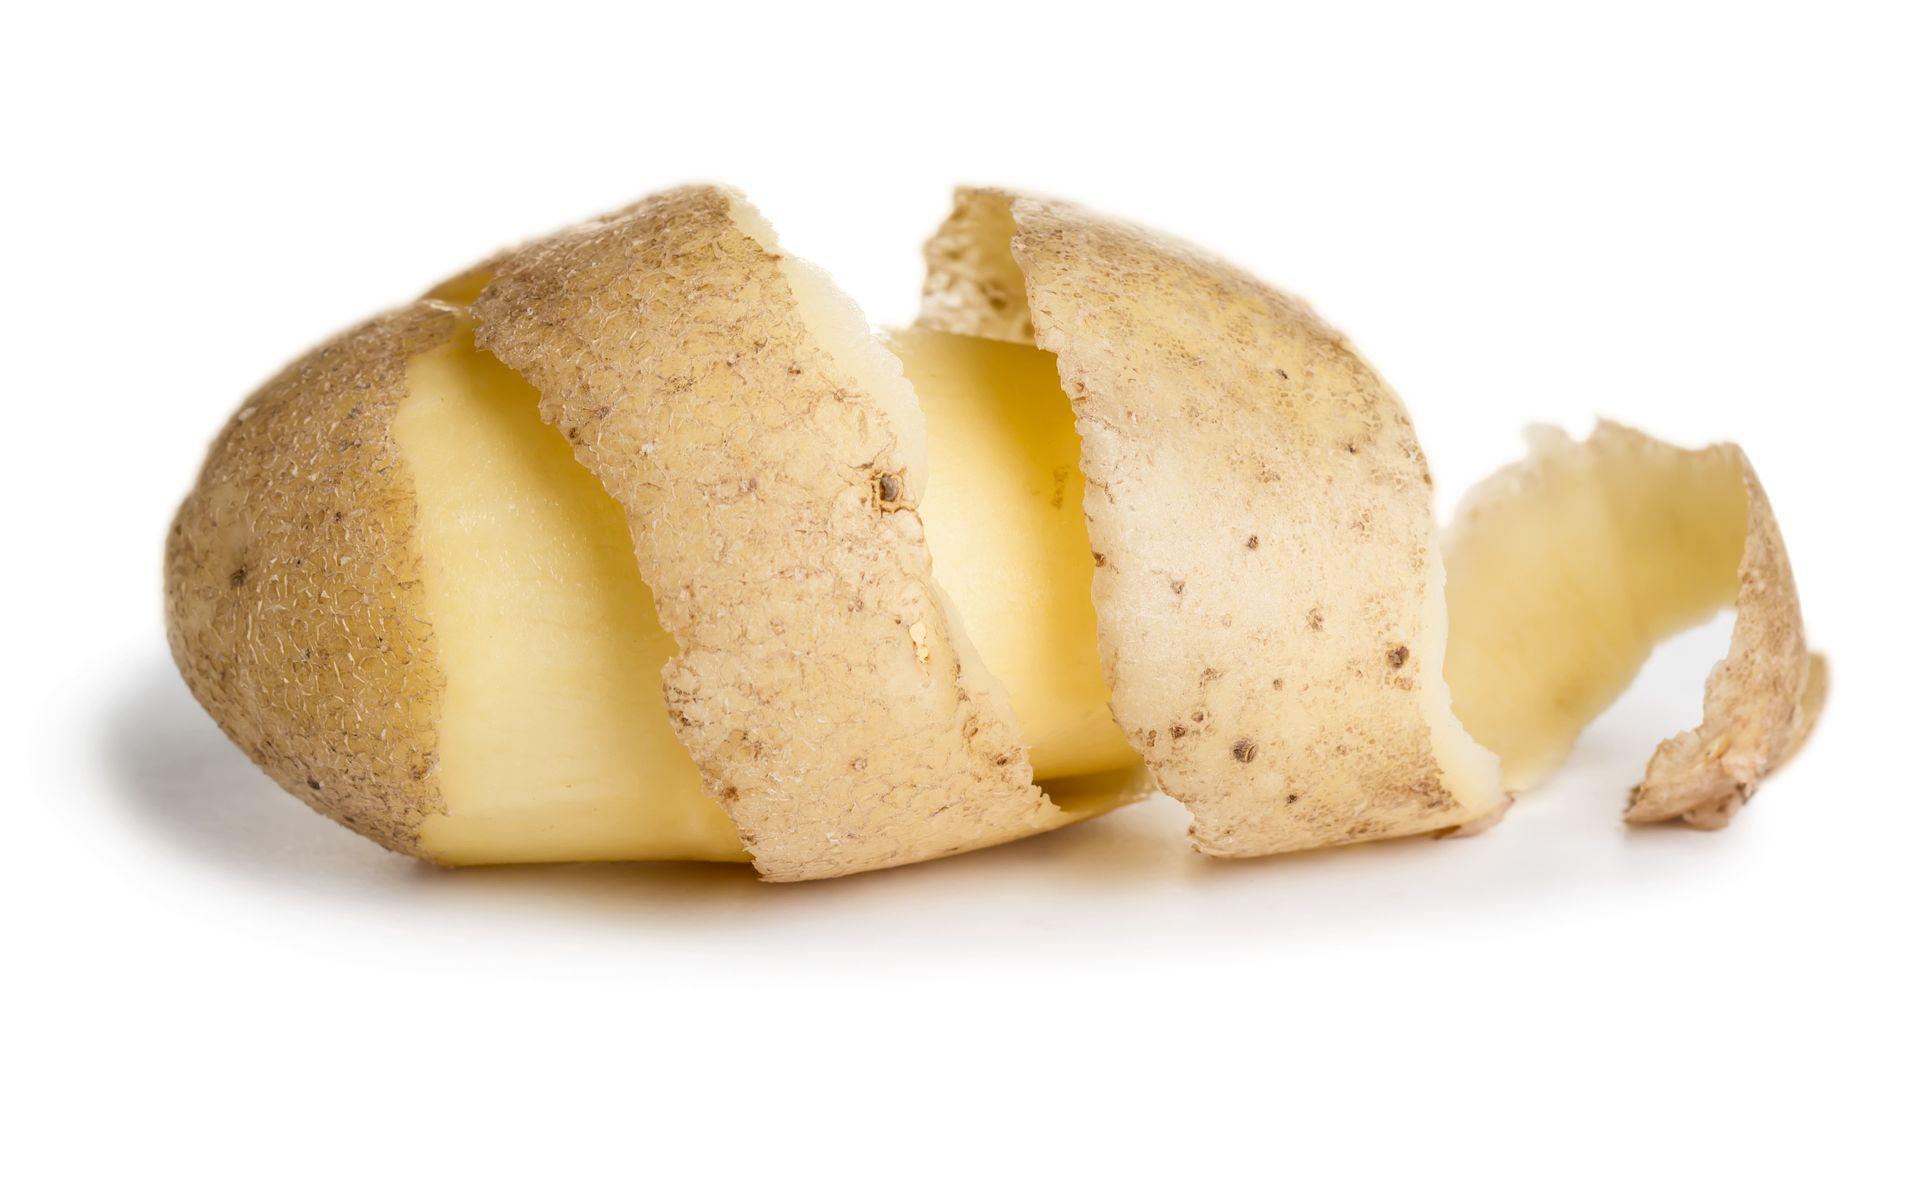 Kartoffel_NEU_3